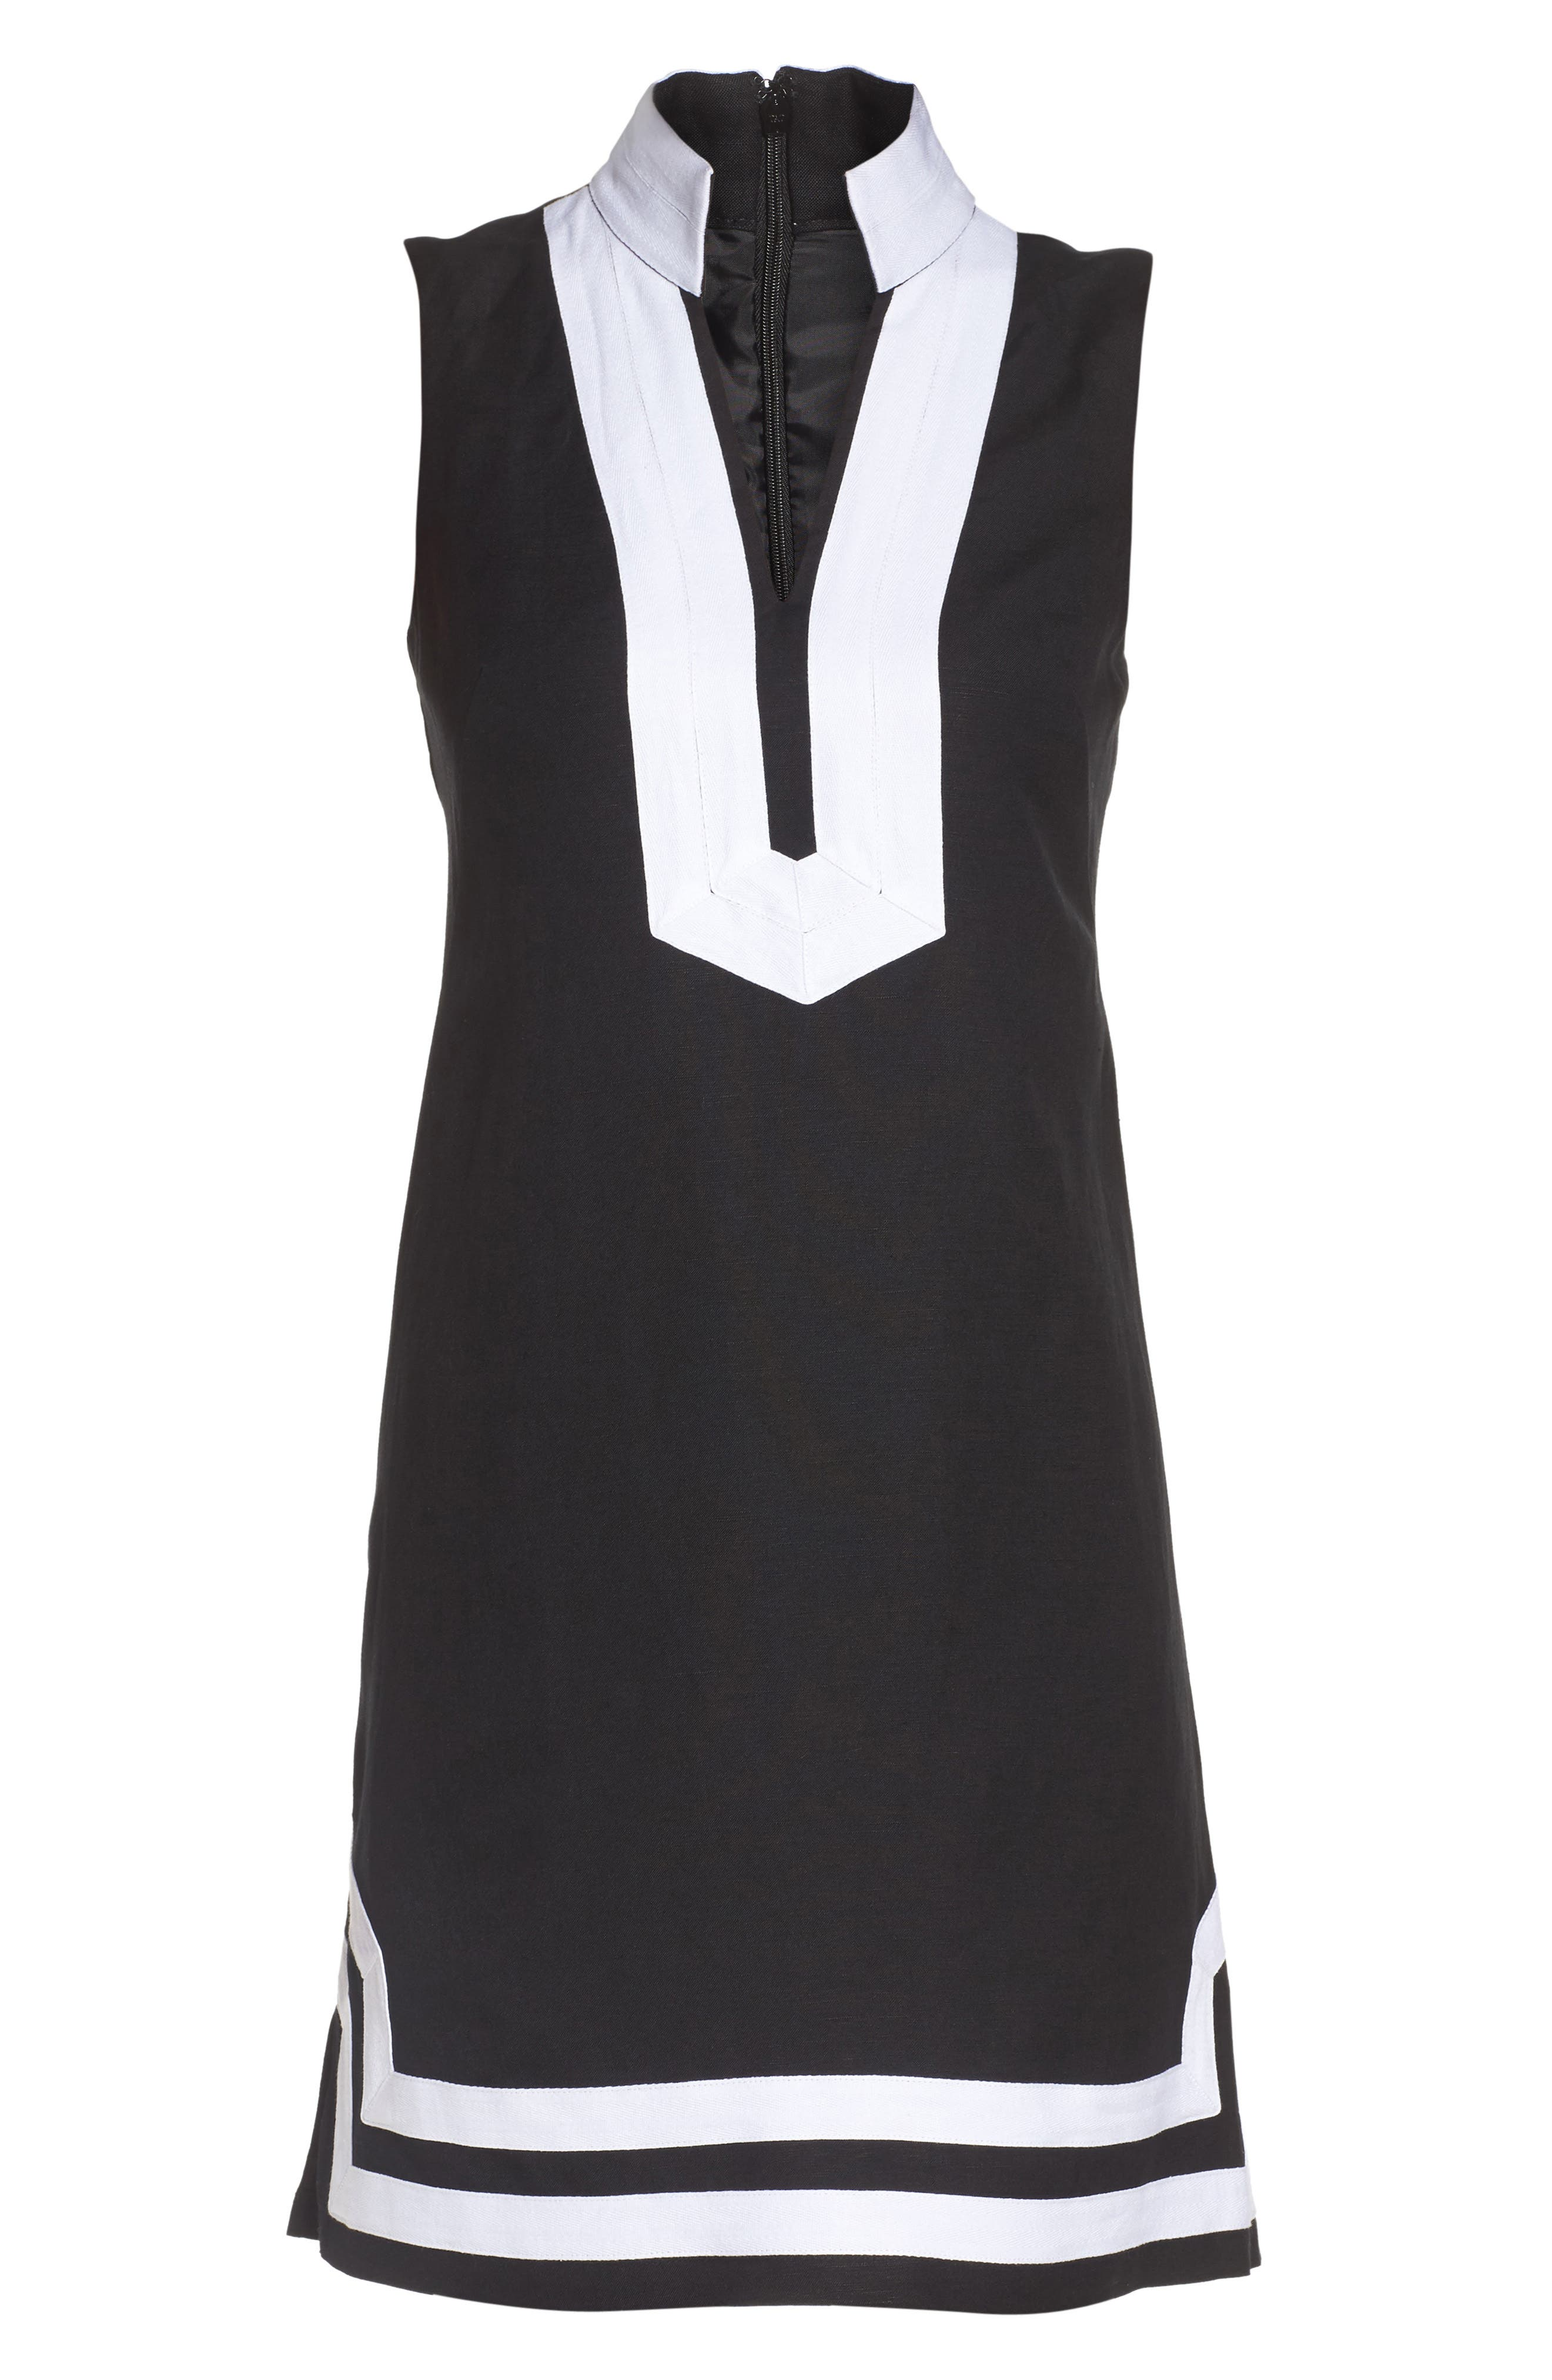 Linen Blend Sheath Dress,                             Alternate thumbnail 6, color,                             Black/ Ivory